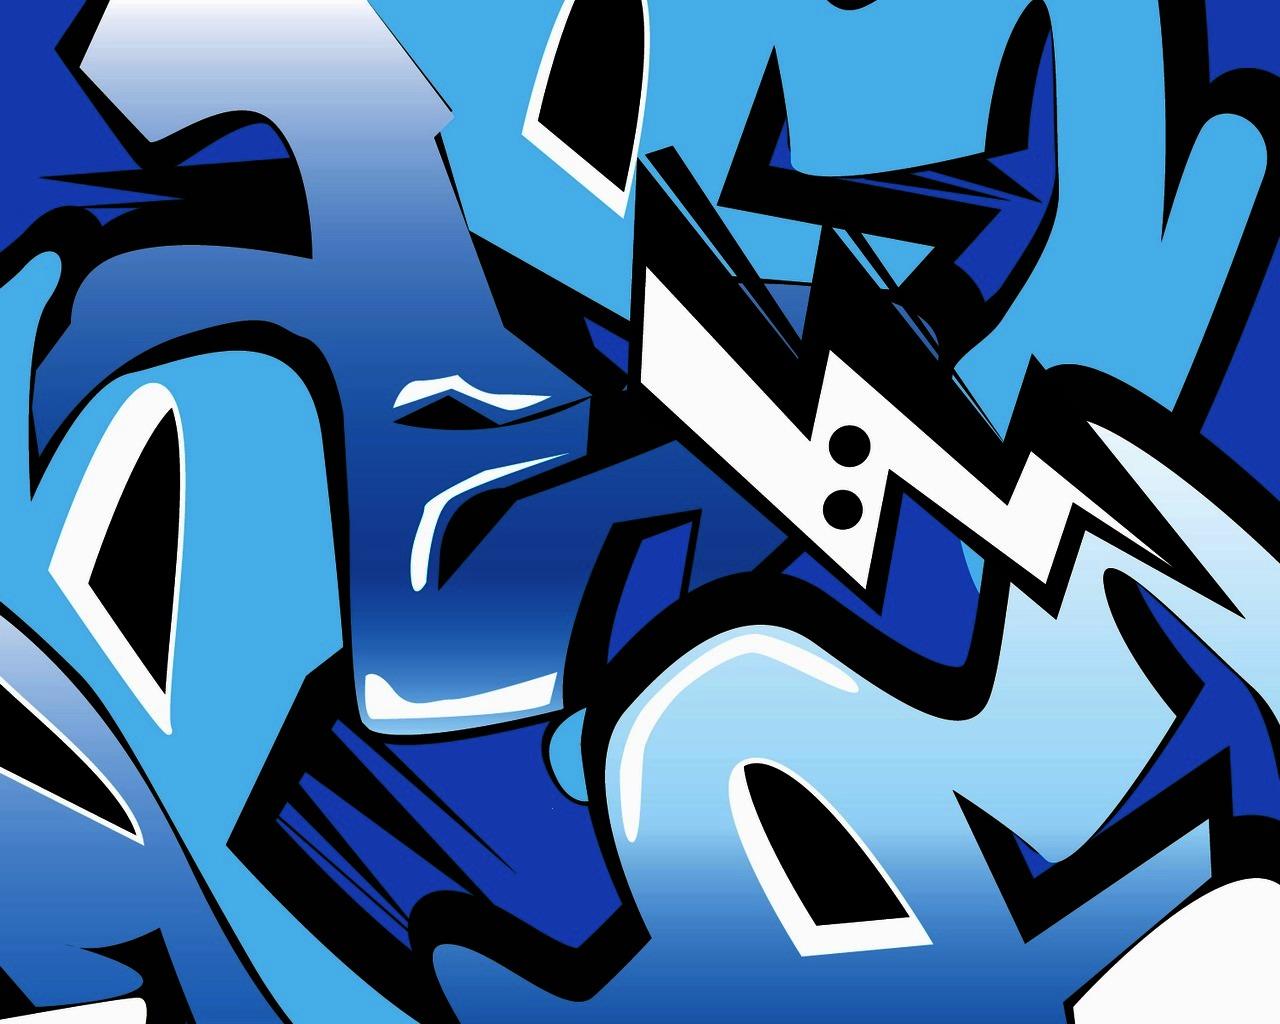 Graffiti Art Music backgrounds PPT Backgrounds